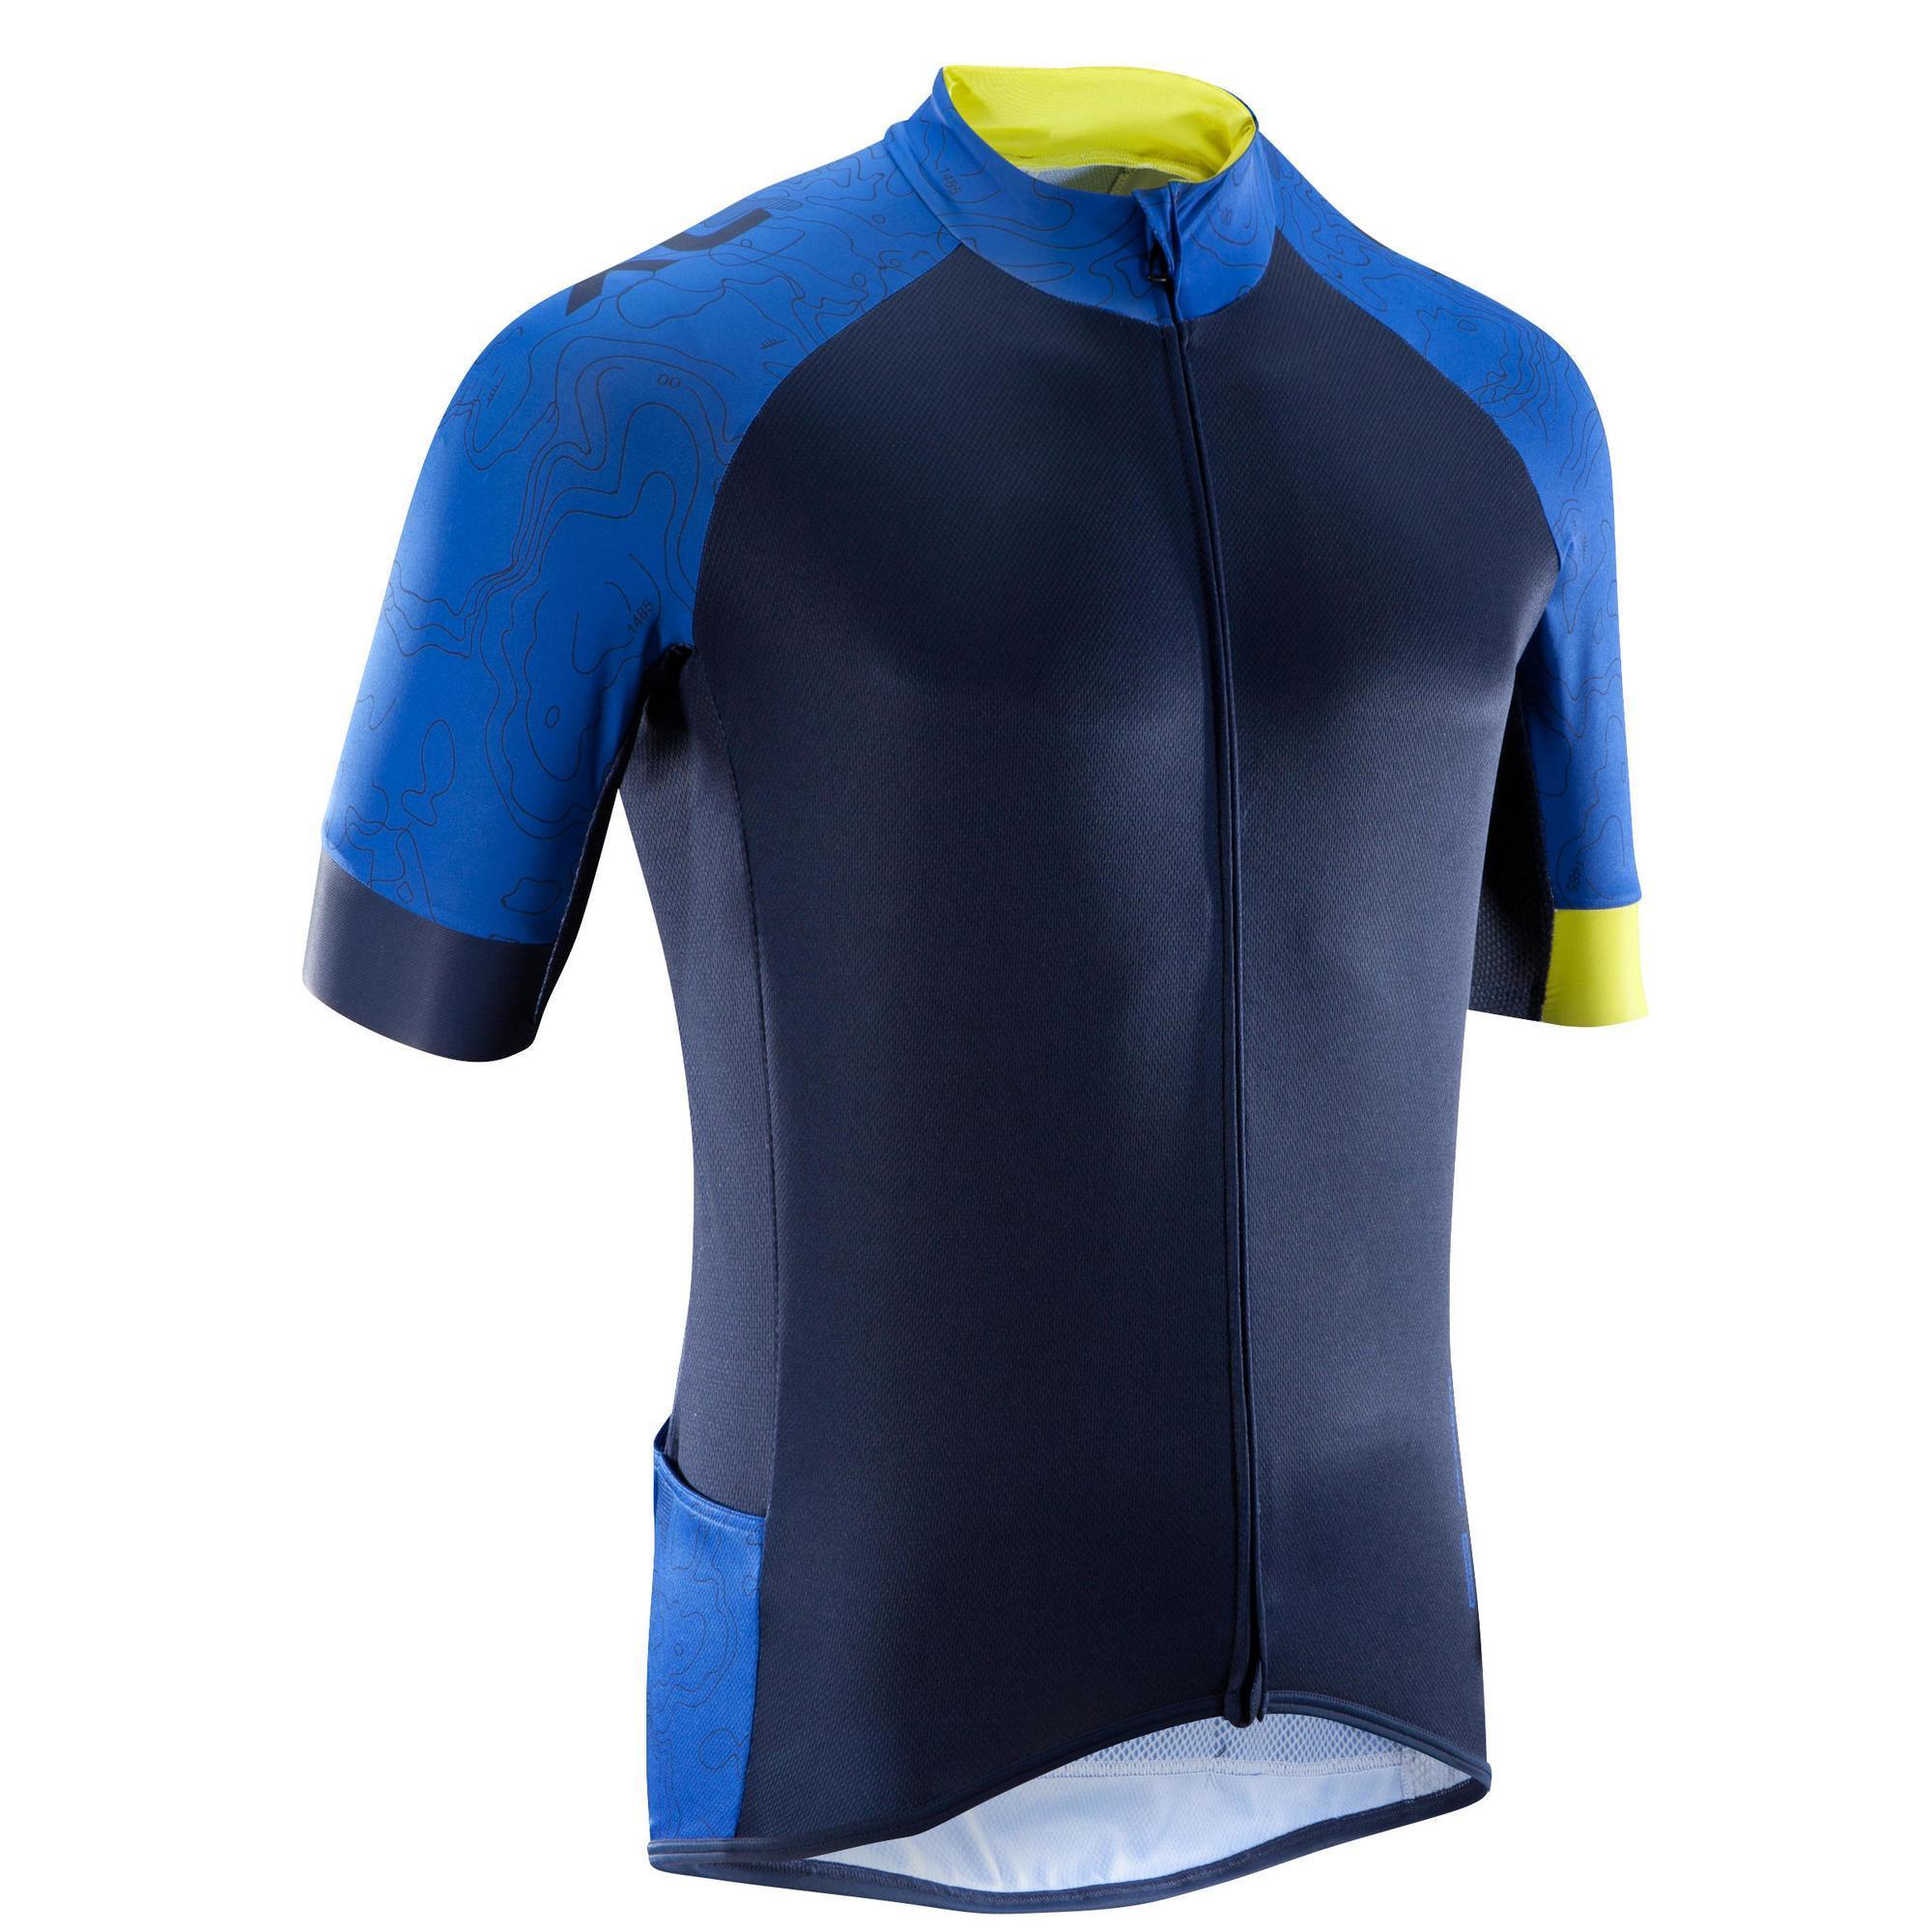 Fahrradtrikot XC 100 kurzarm MTB blau | Sportbekleidung > Trikots > Fahrradtrikots | Rockrider